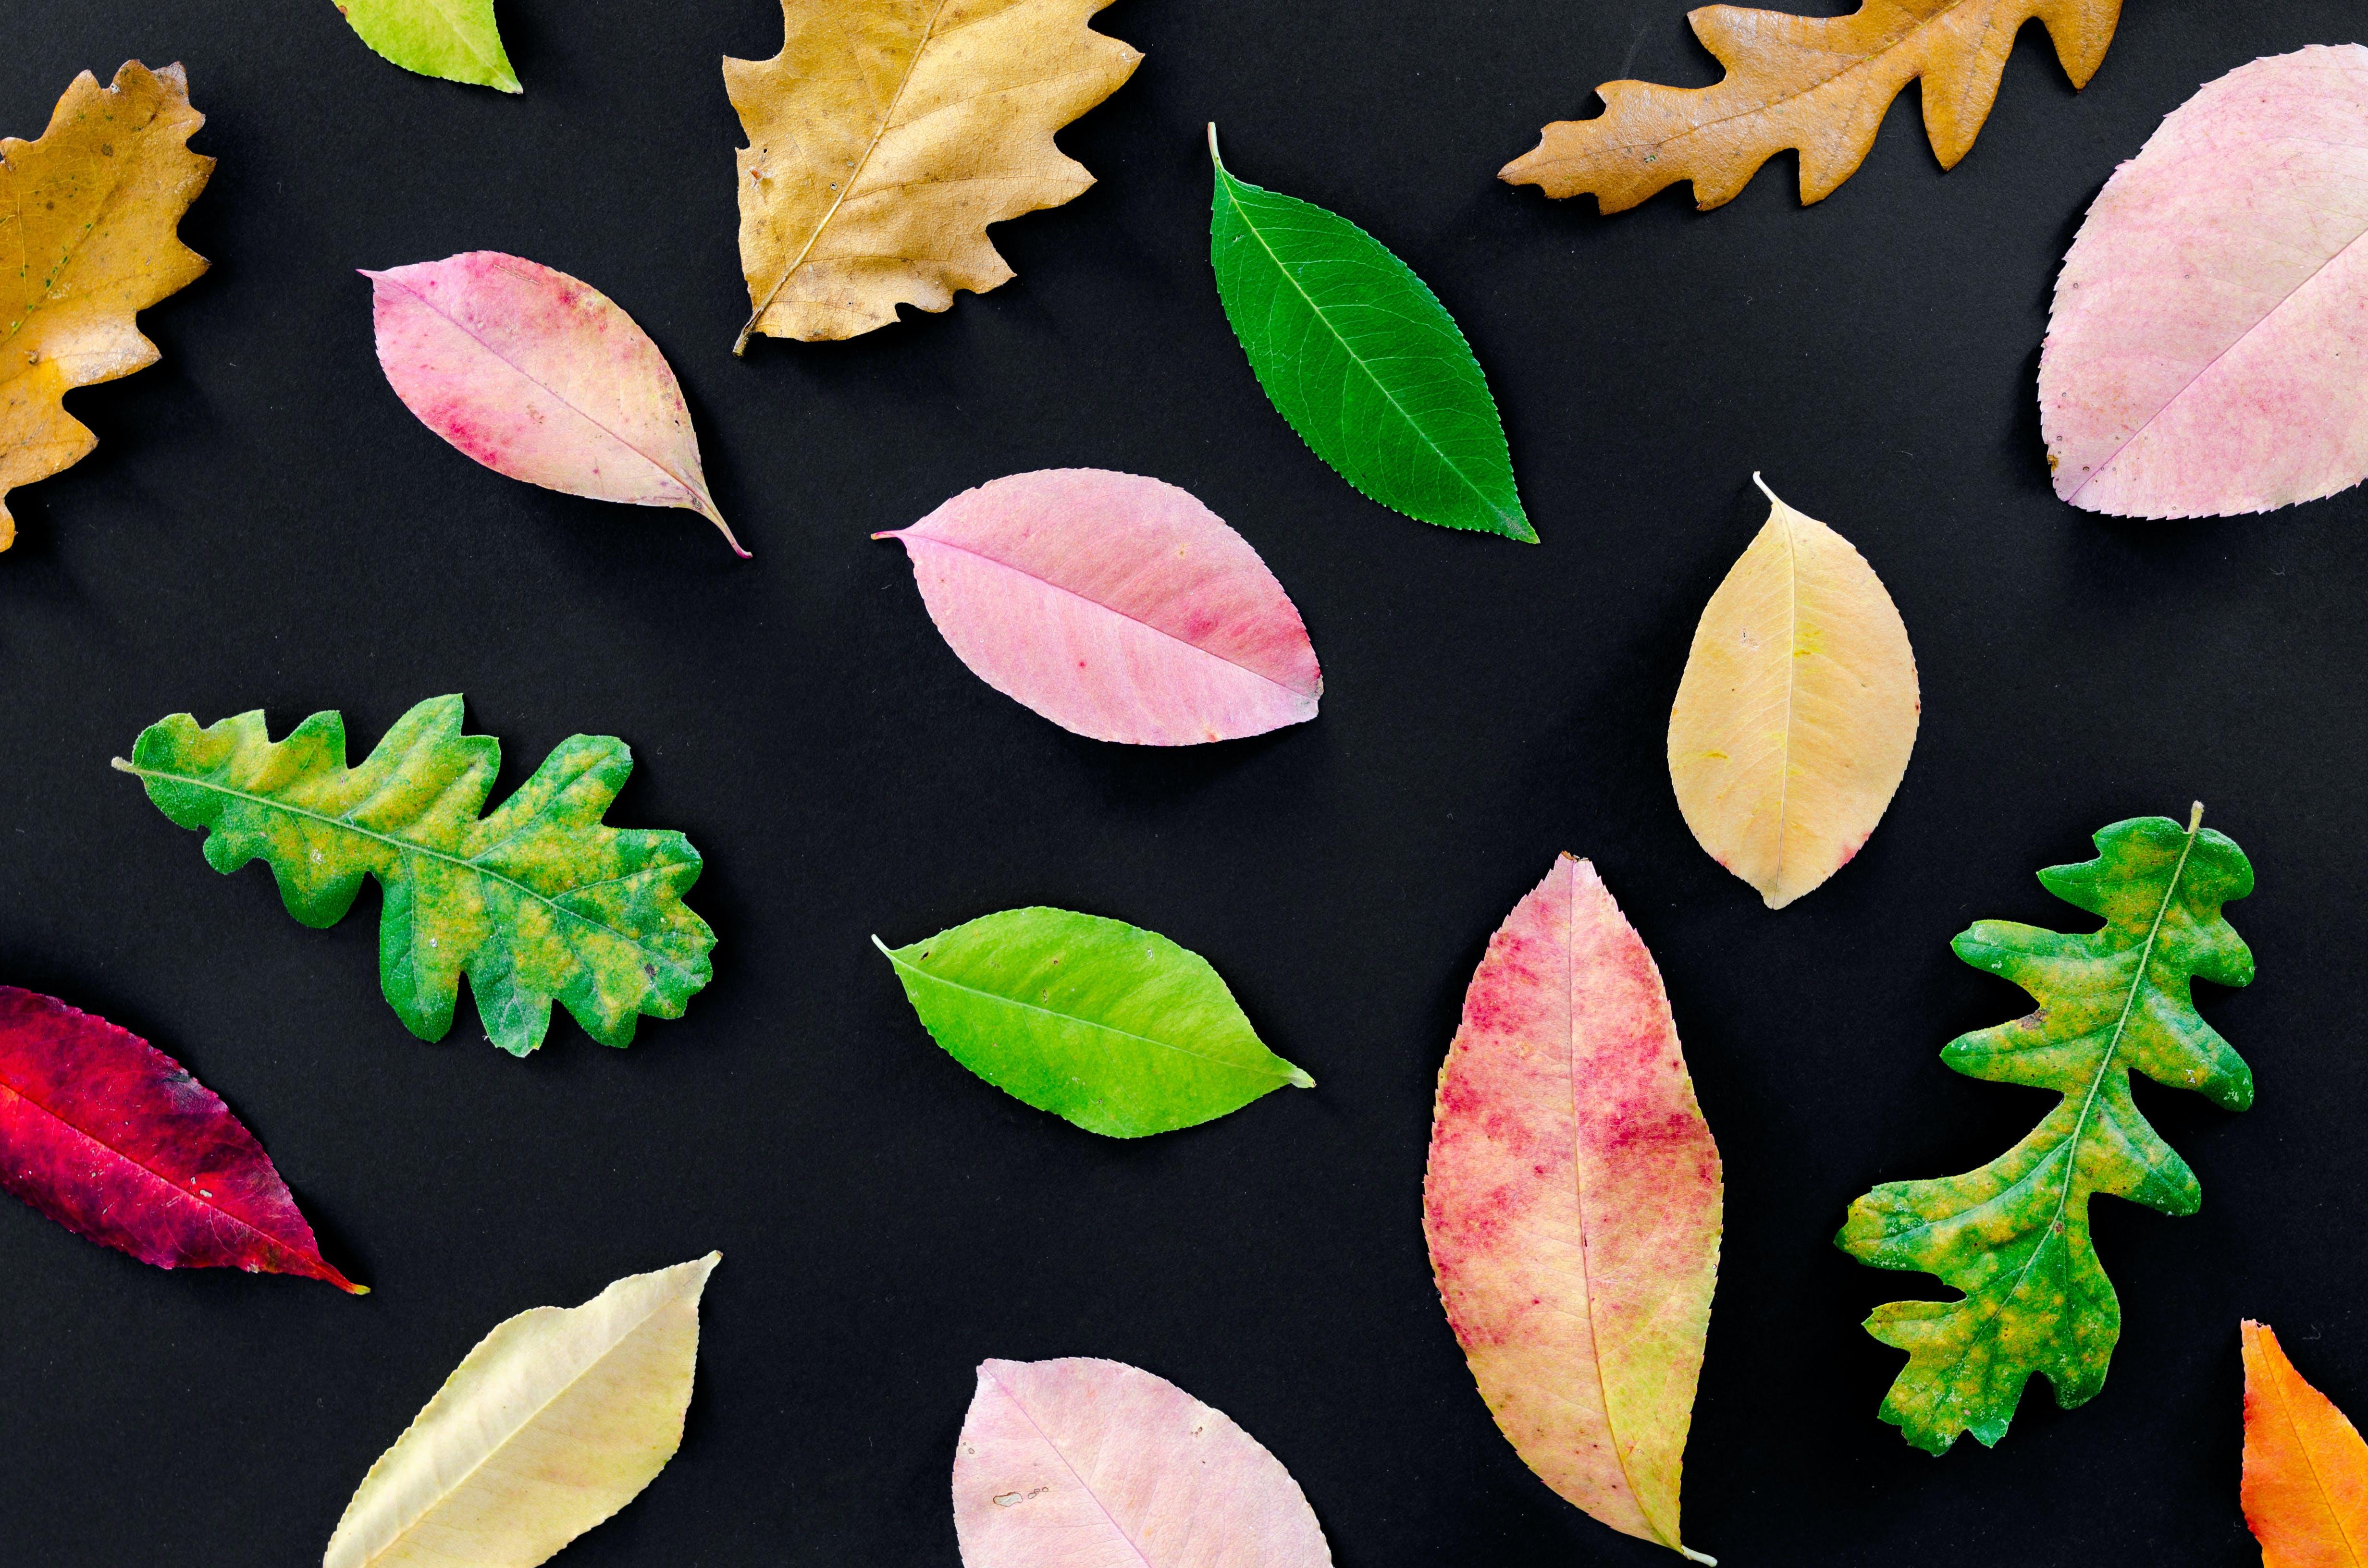 autumn, dry, fall